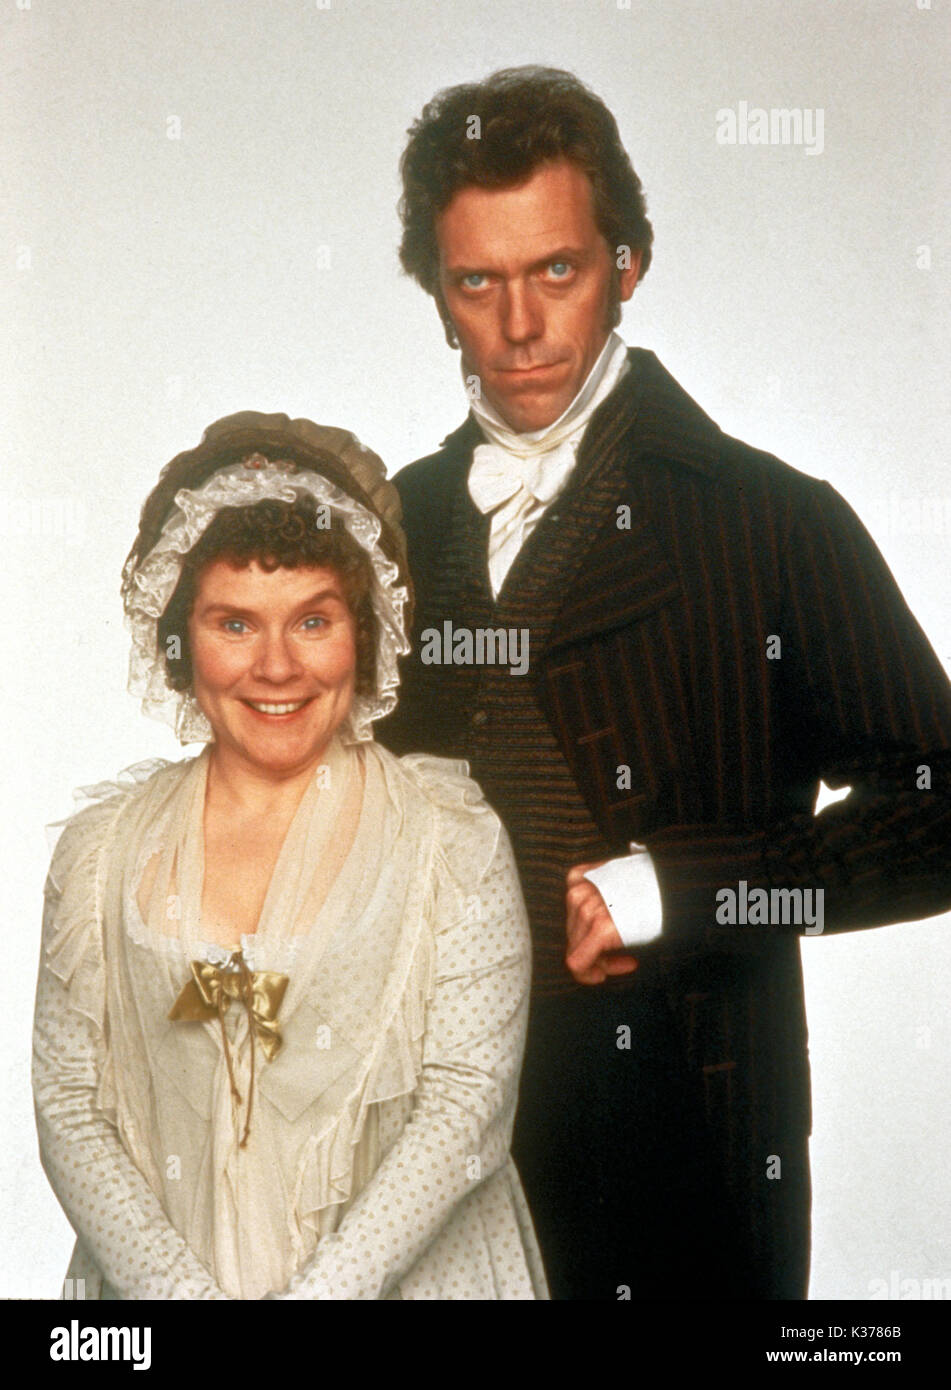 SENSE AND SENSIBILITY IMELDA STAUNTON AS CHARLOTTE PALMER HUGH LAURIE AS MR PALMER     Date: 1995 - Stock Image